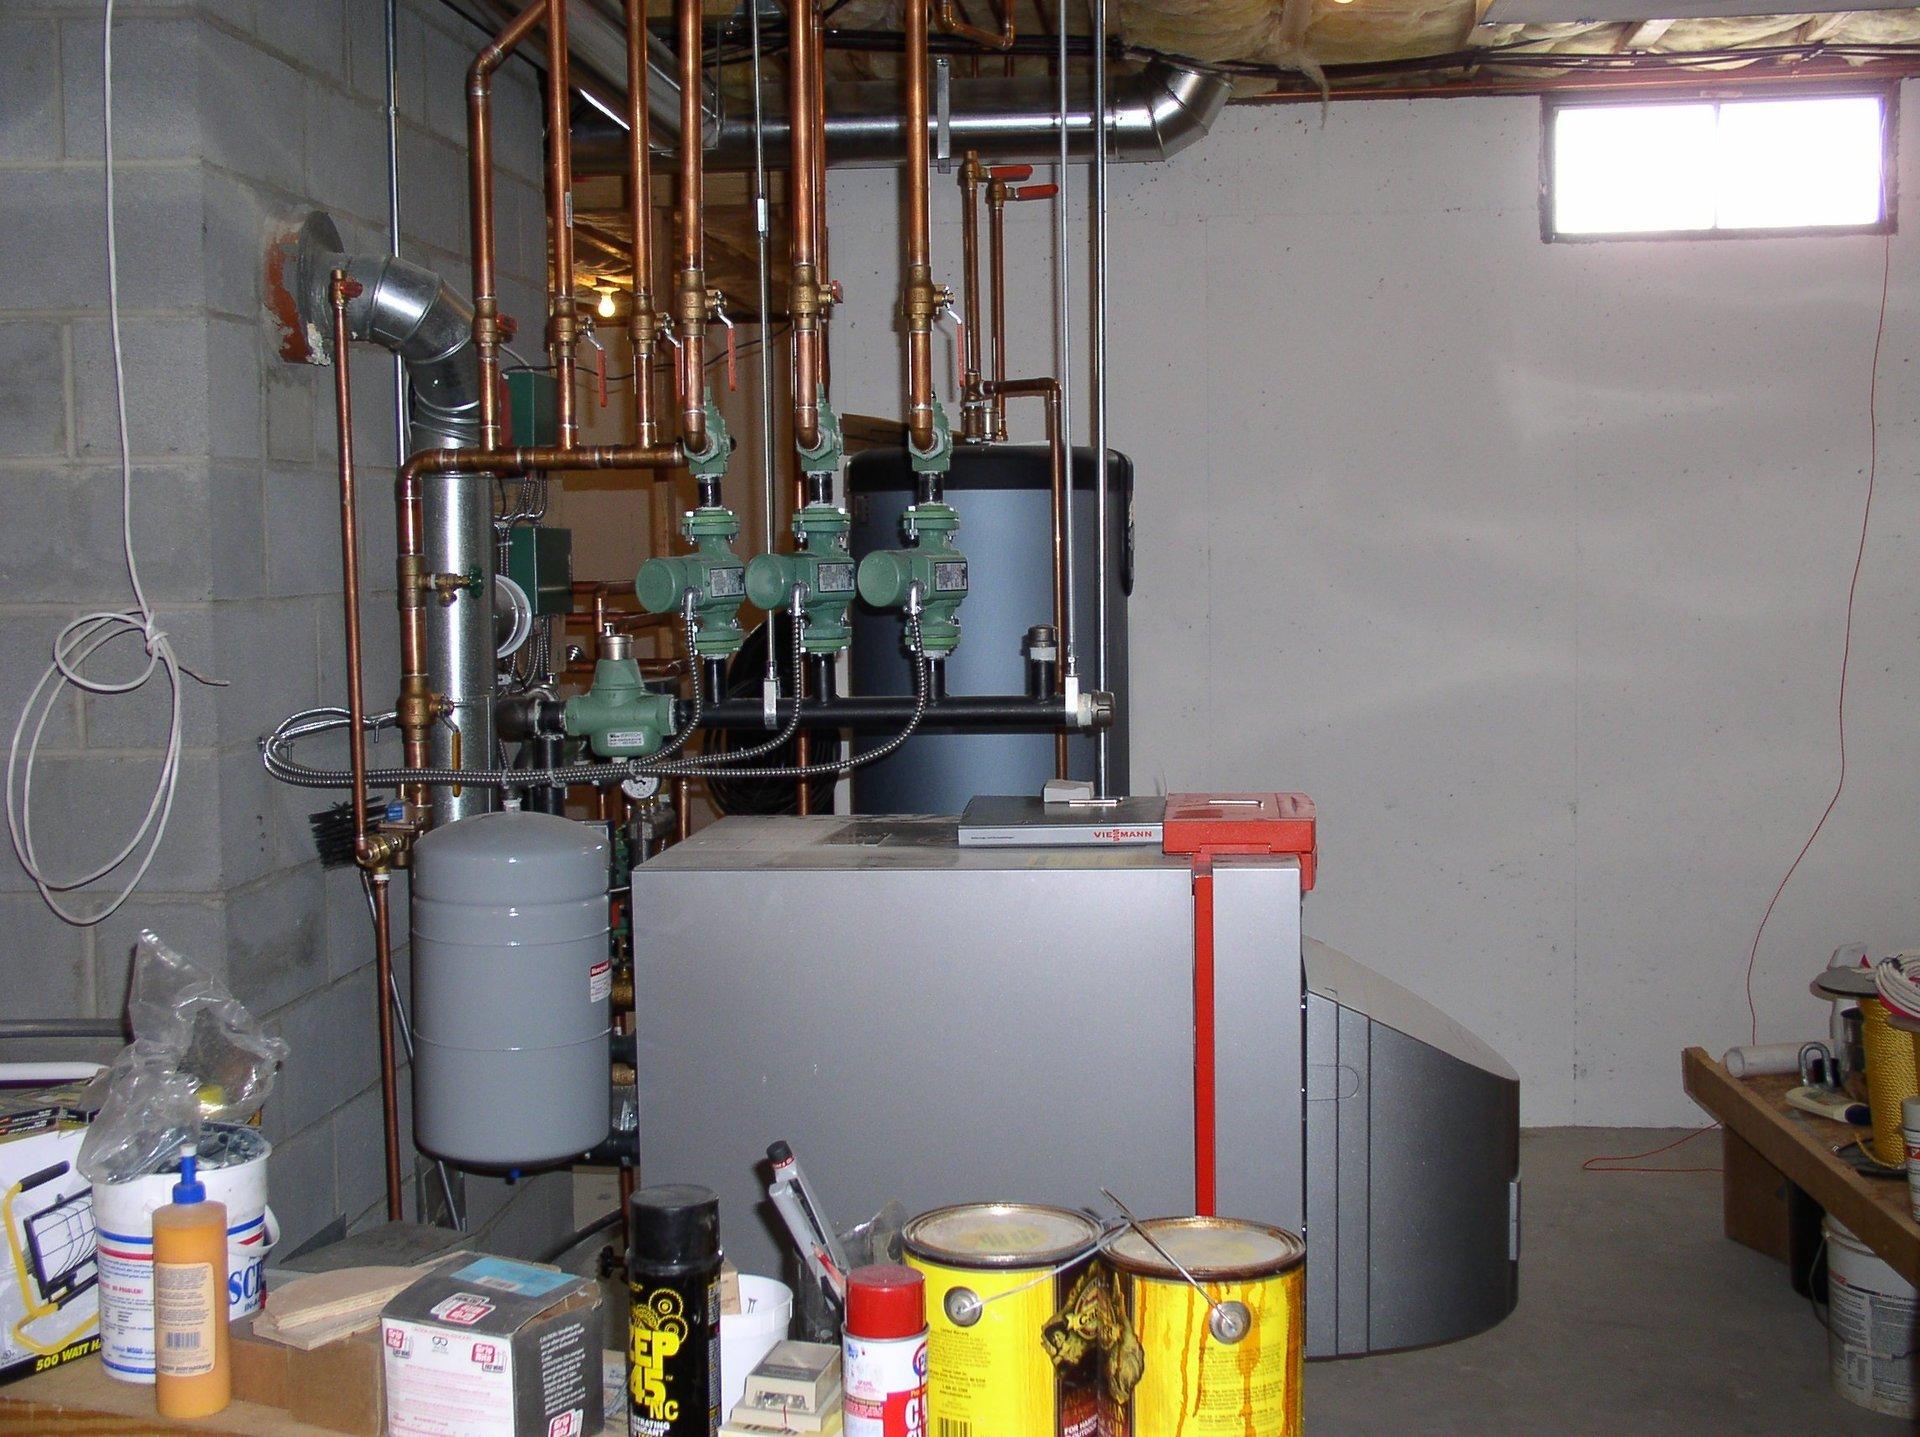 Montanari Fuel Service, Inc. image 1